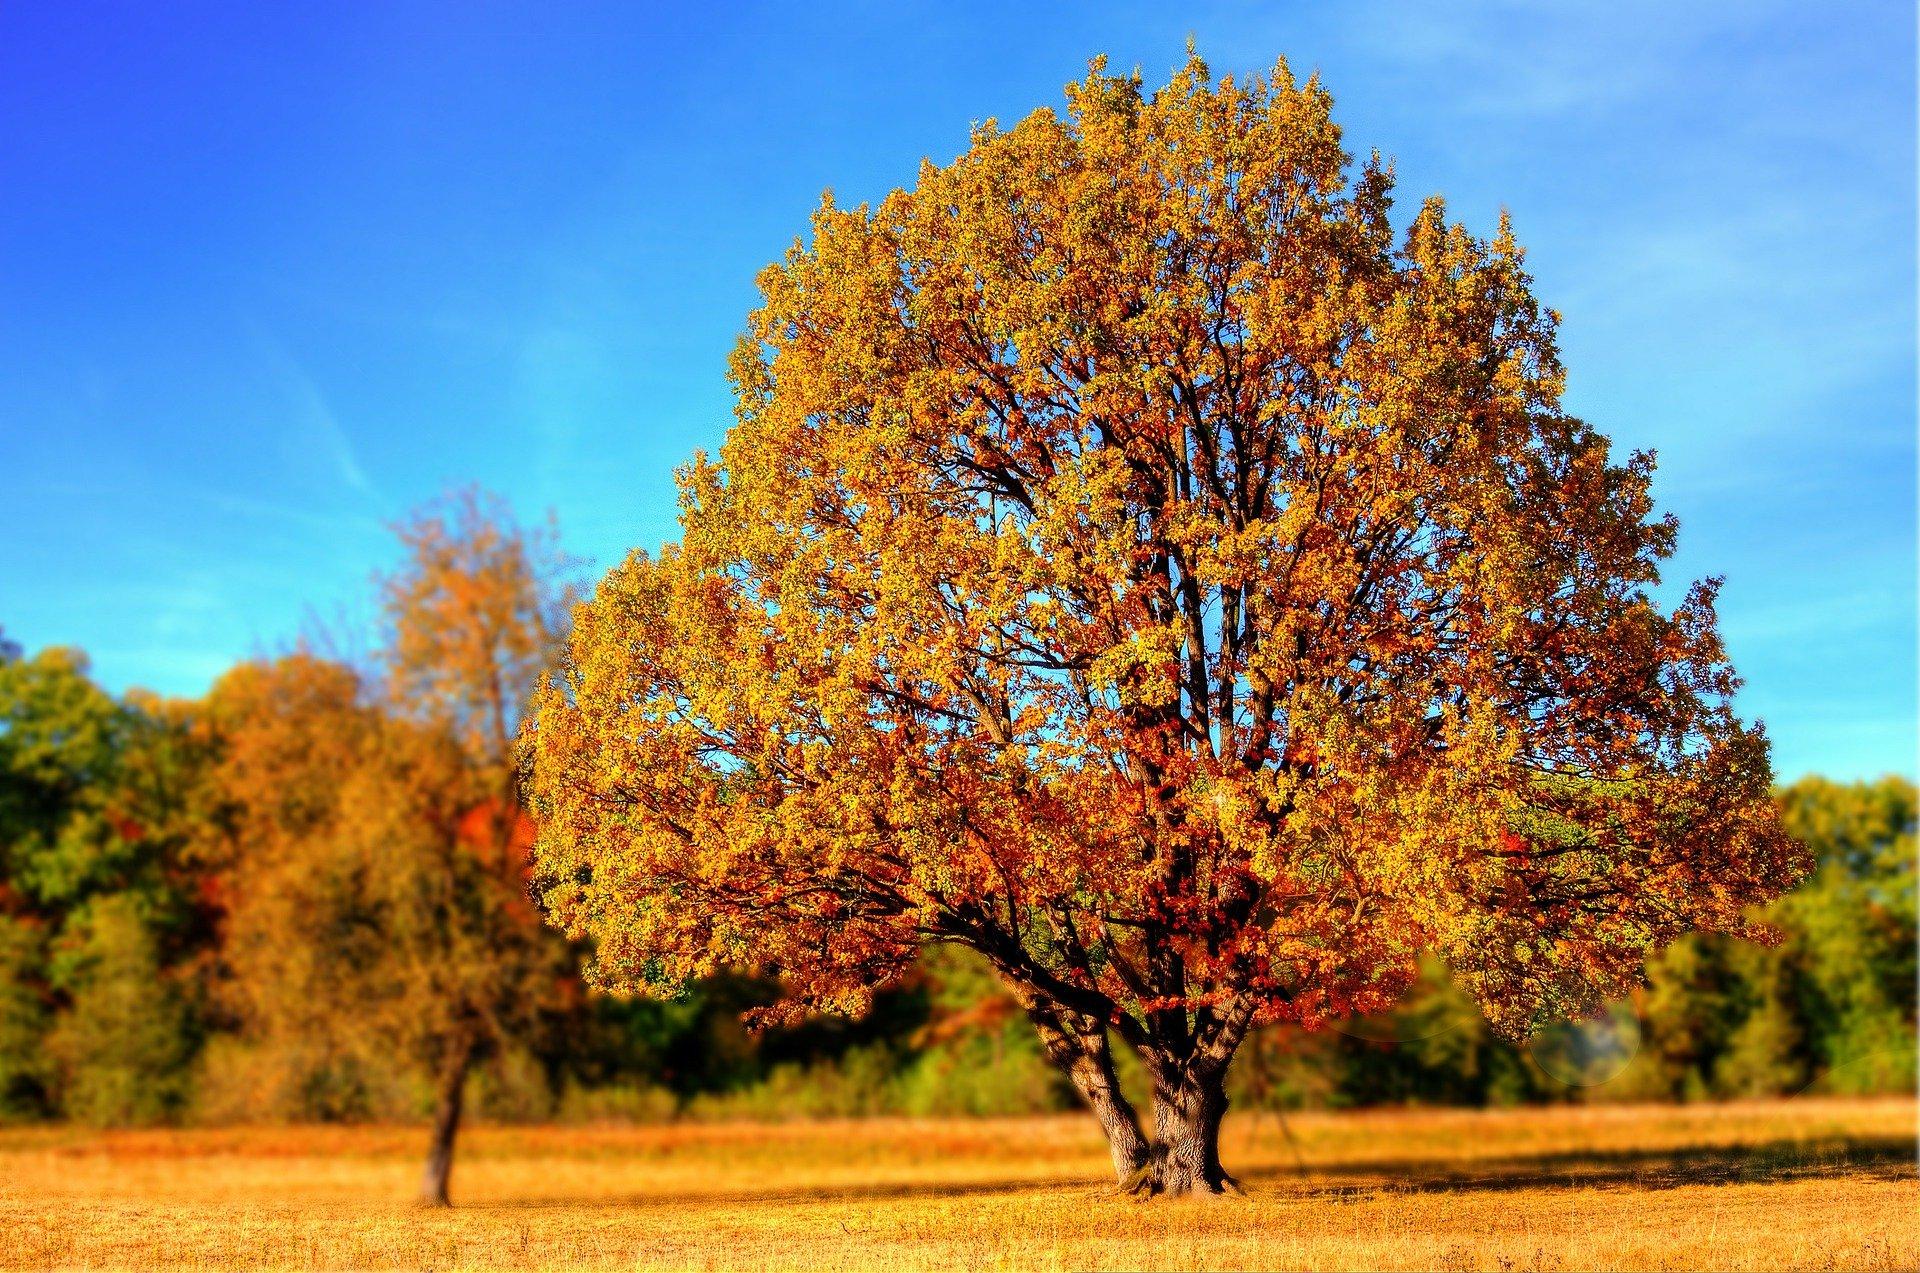 tree-99852_1920